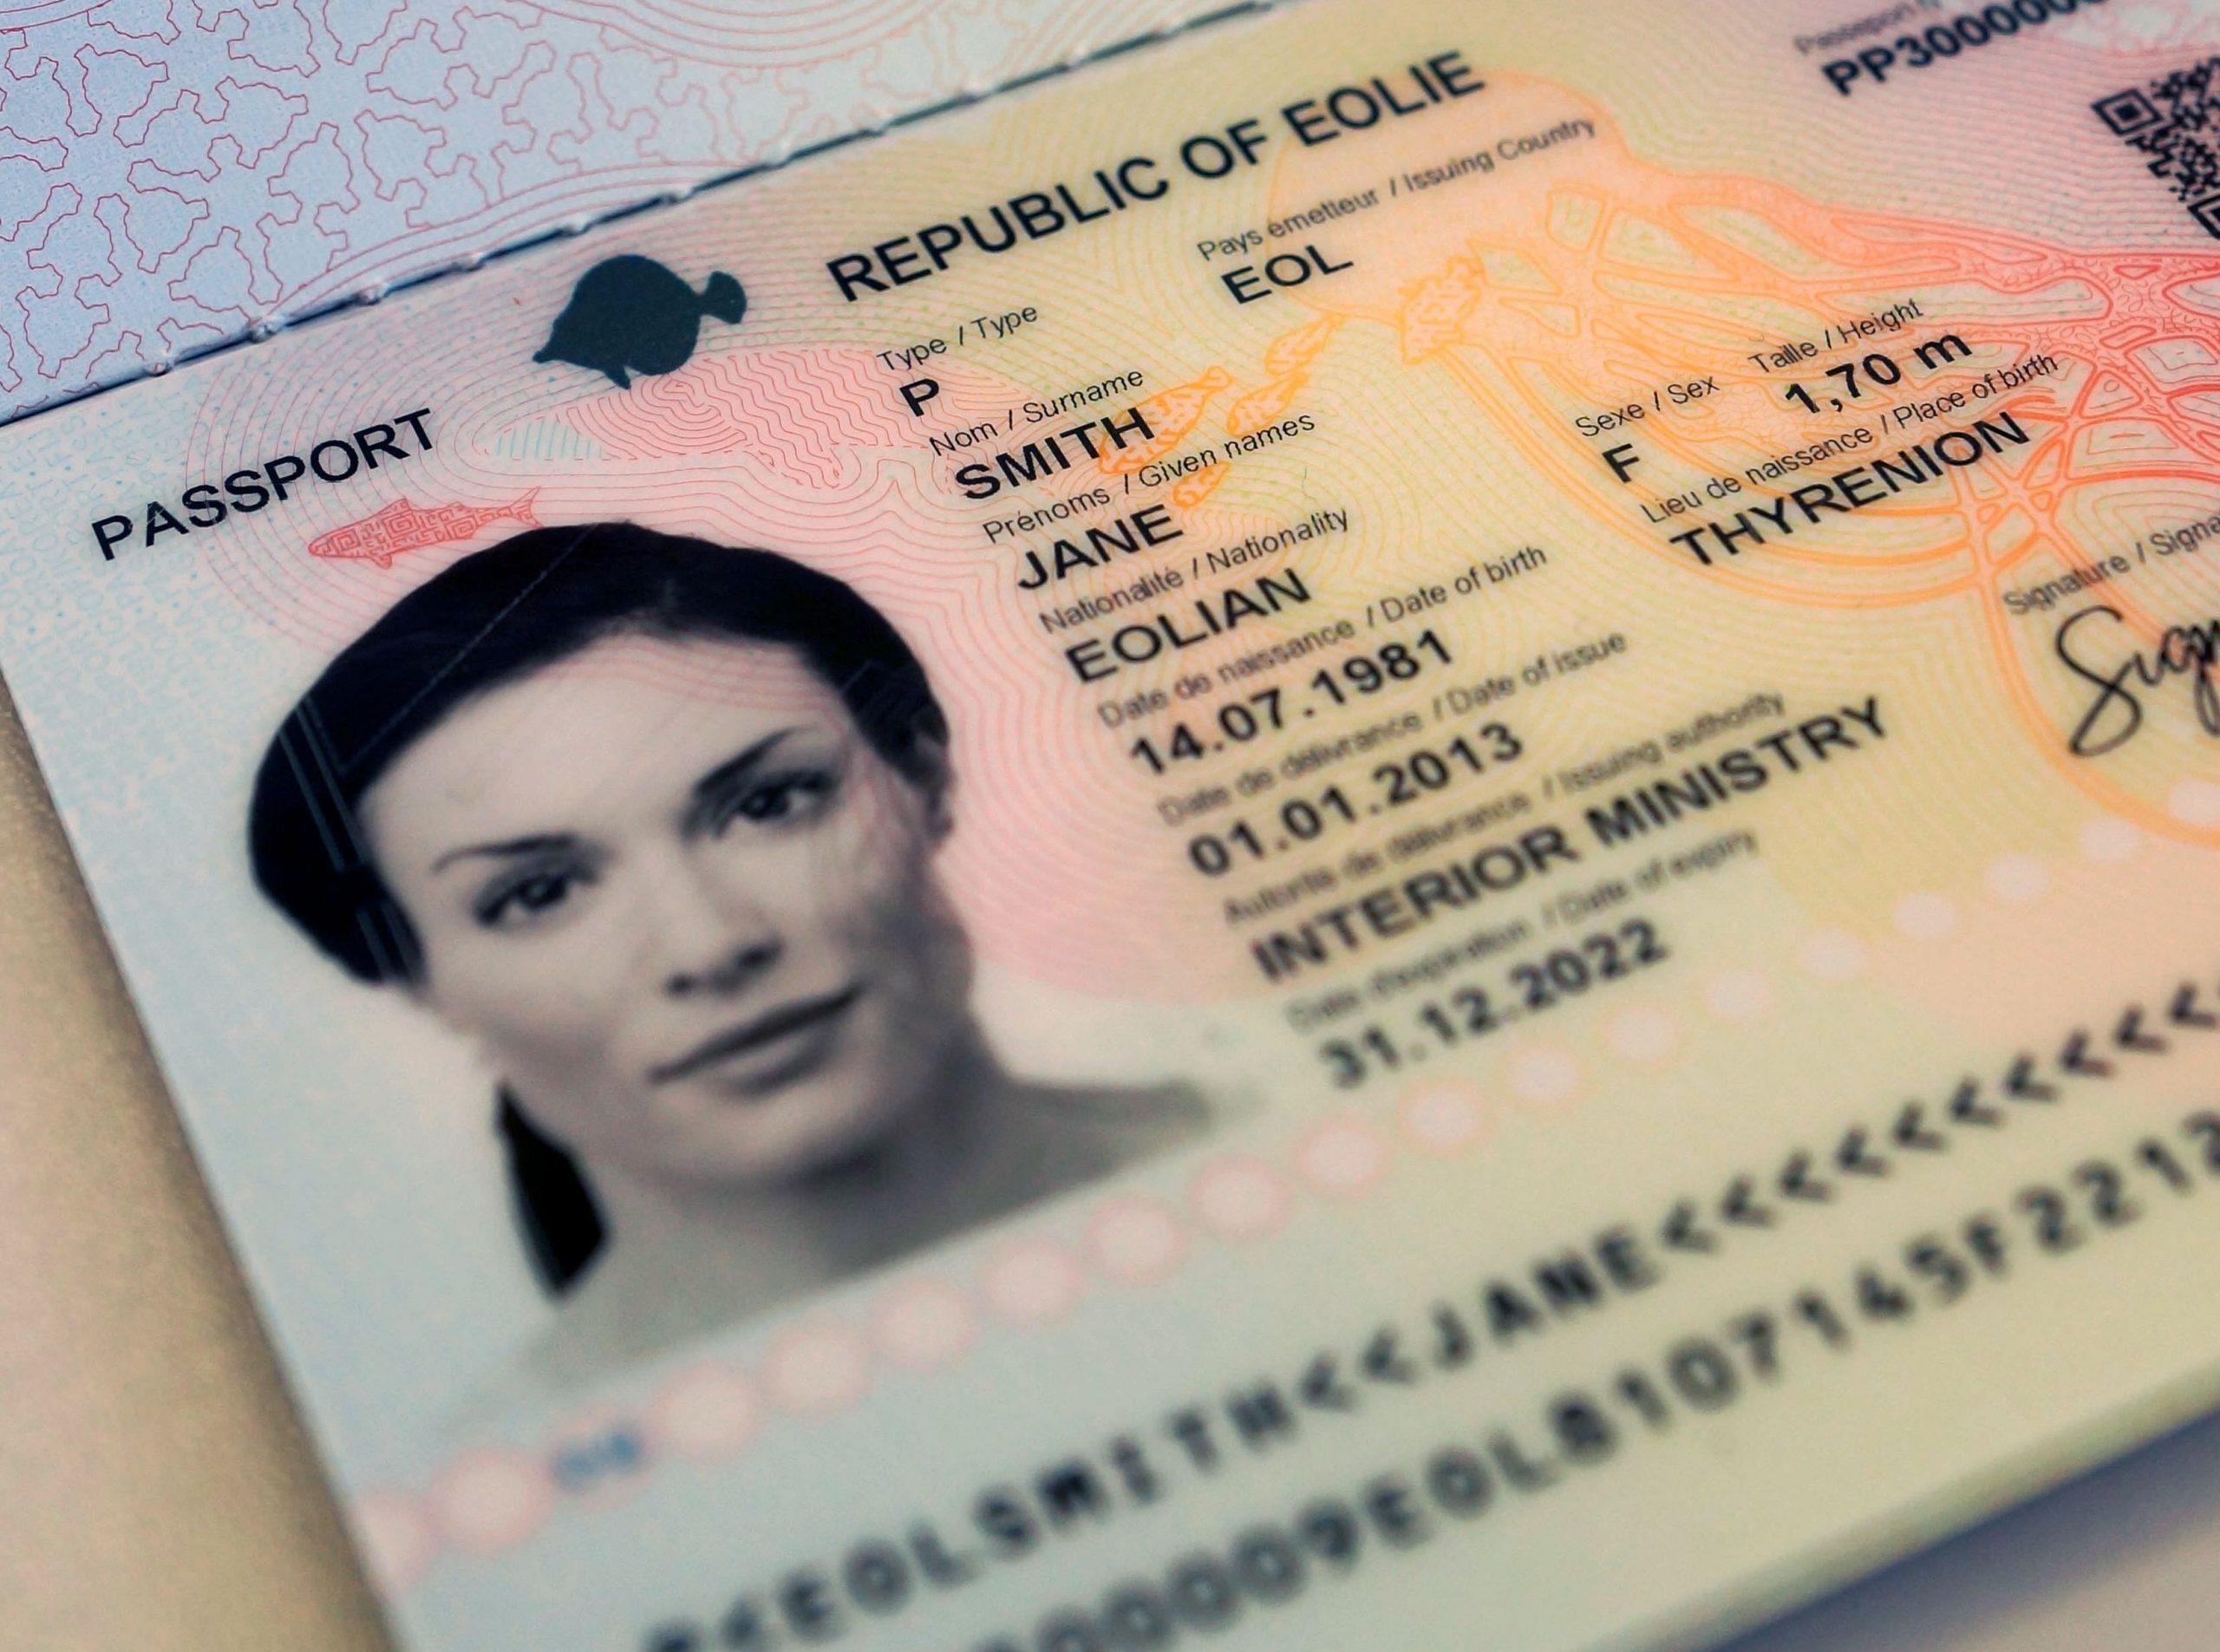 comment renouveler passeport